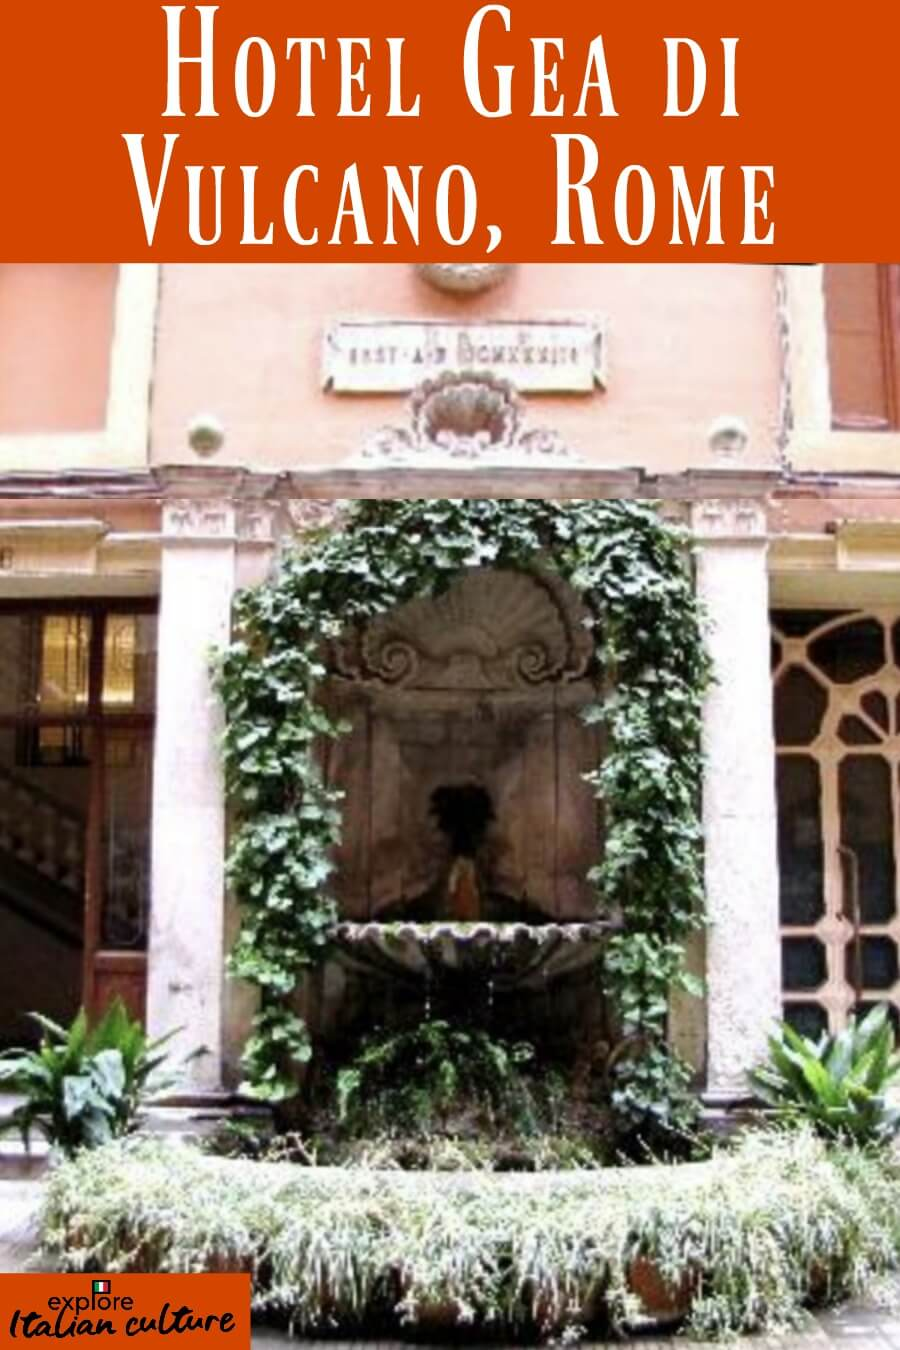 Hotel Gea di Vulcano, Rome Review - pin for later.